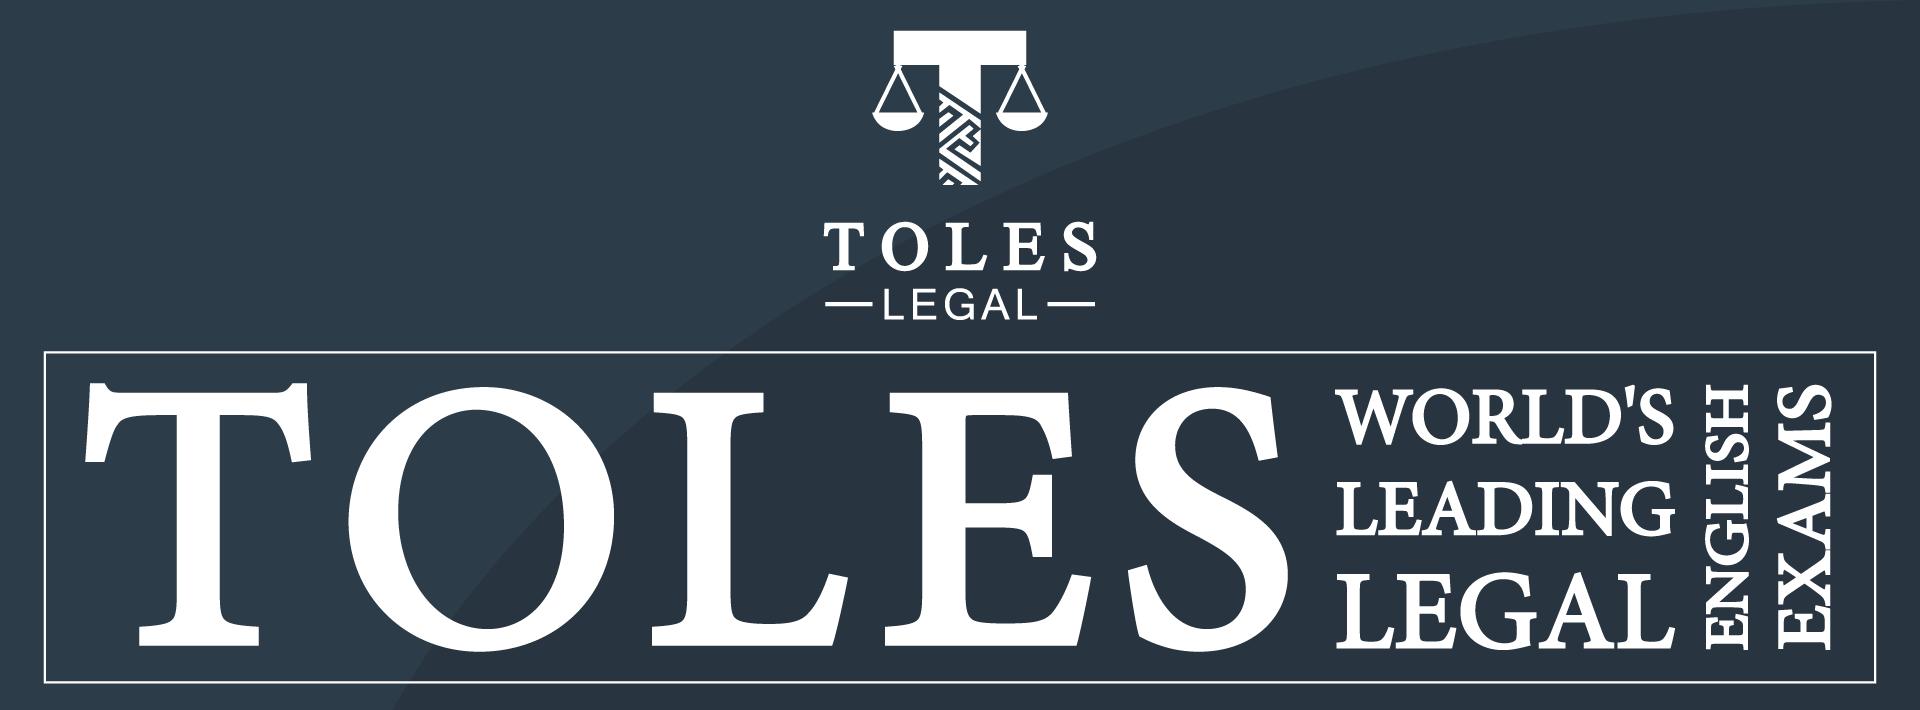 (TOLES) Test of legal english skills